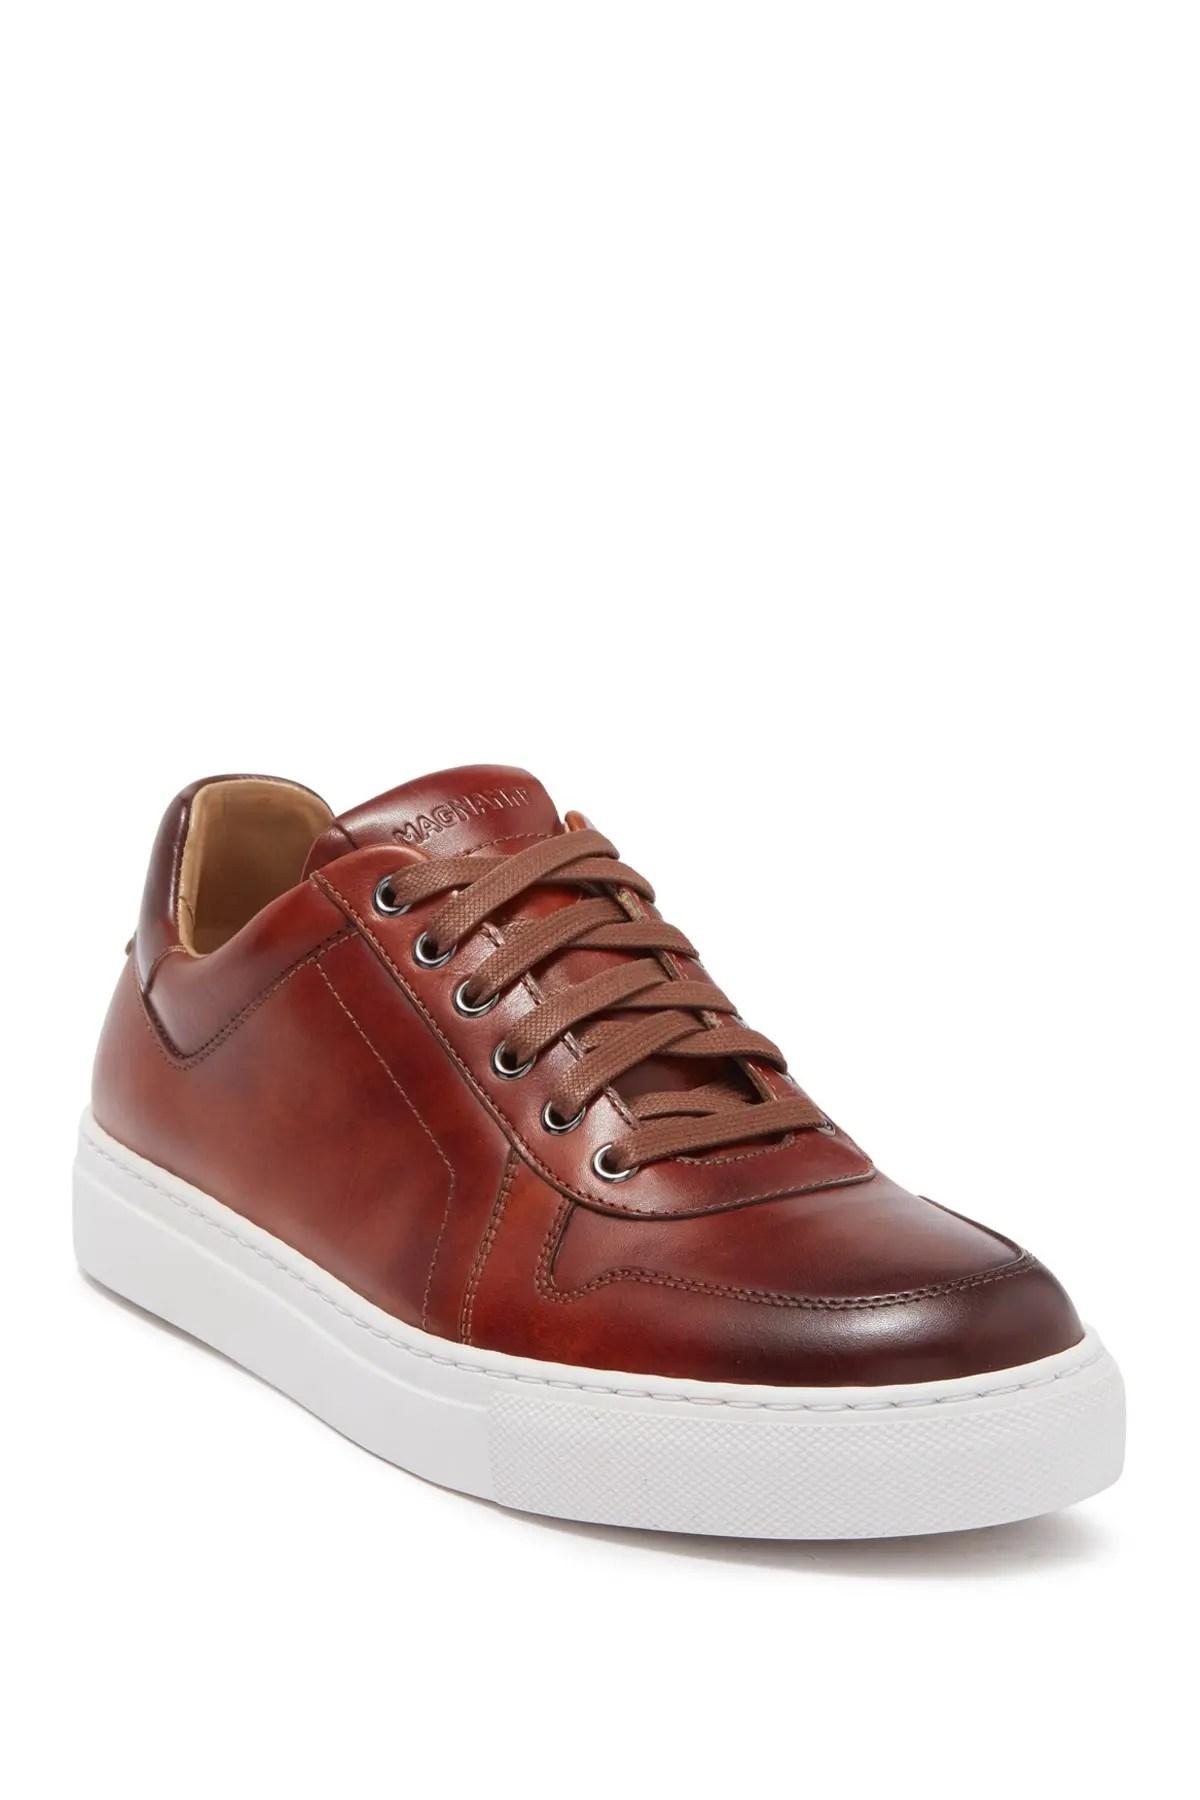 shoes for men clearance nordstrom rack